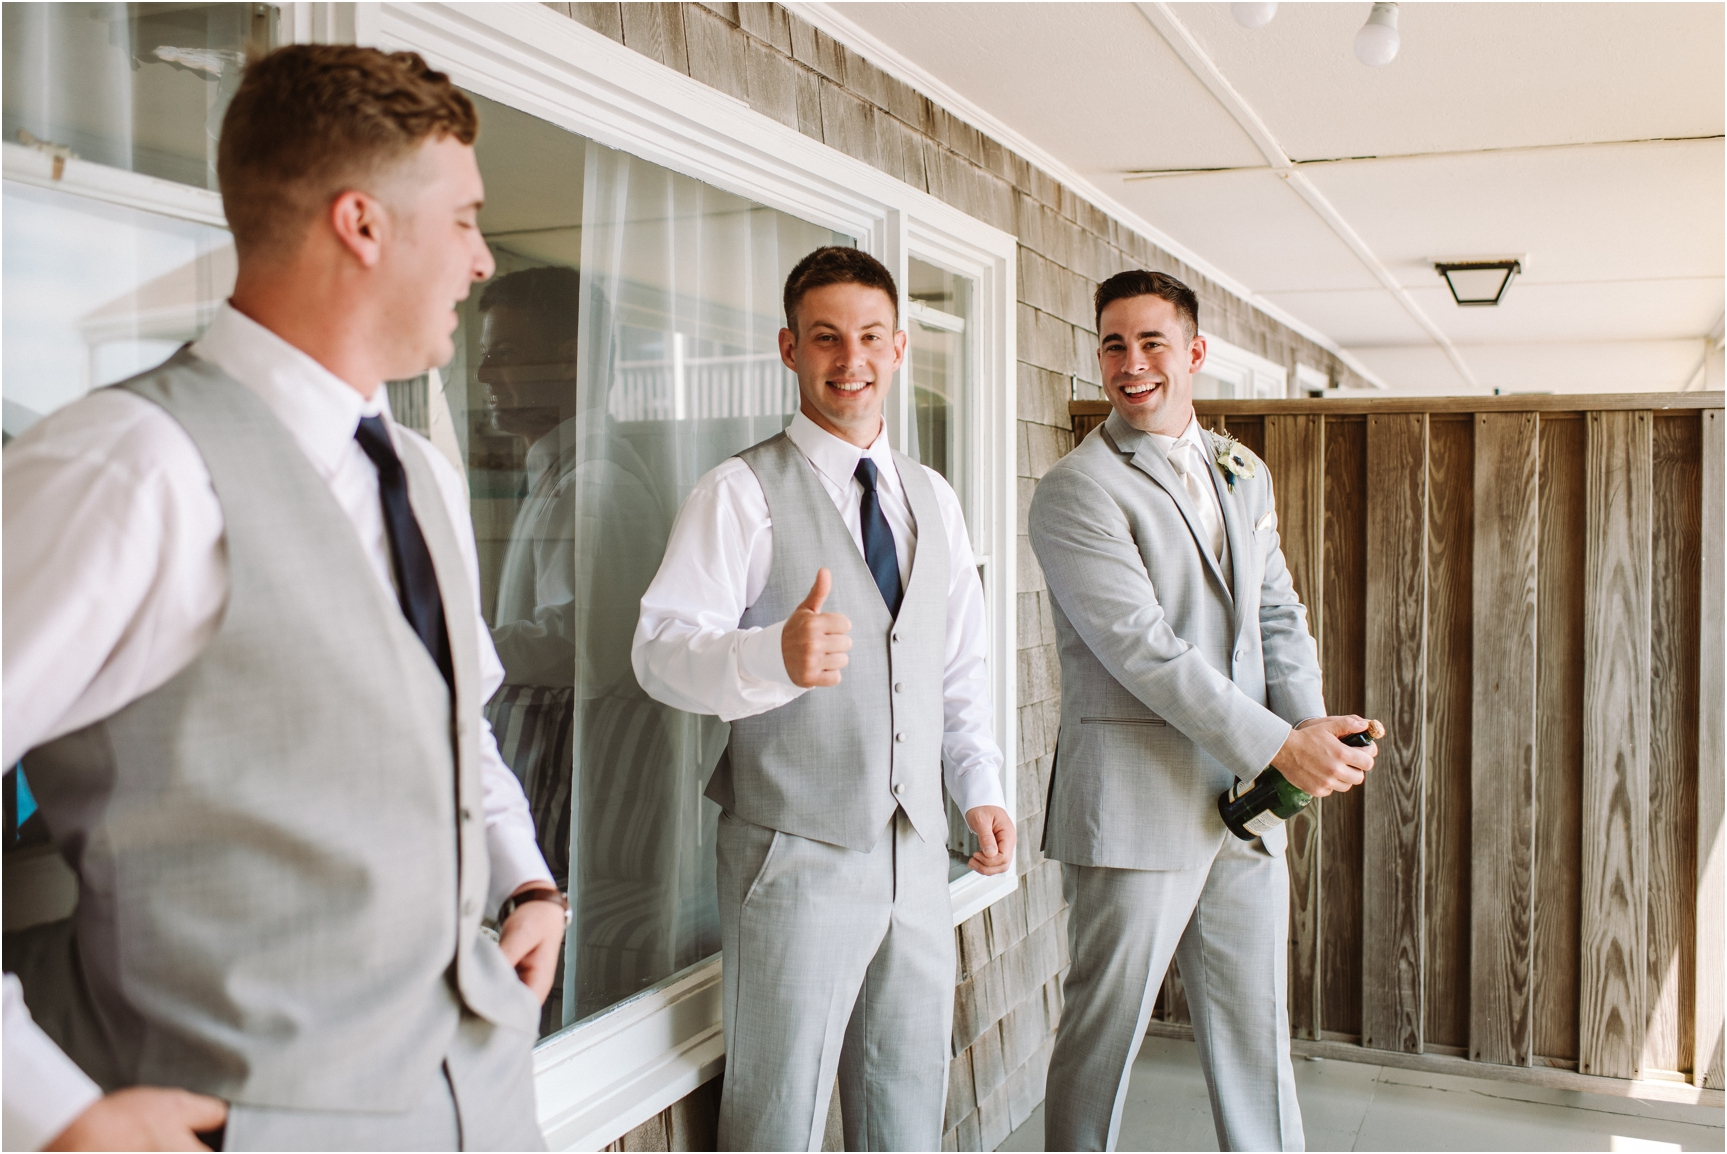 Sarah & Sam Pelham House Cape Cod Wedding Photographer-32.jpg